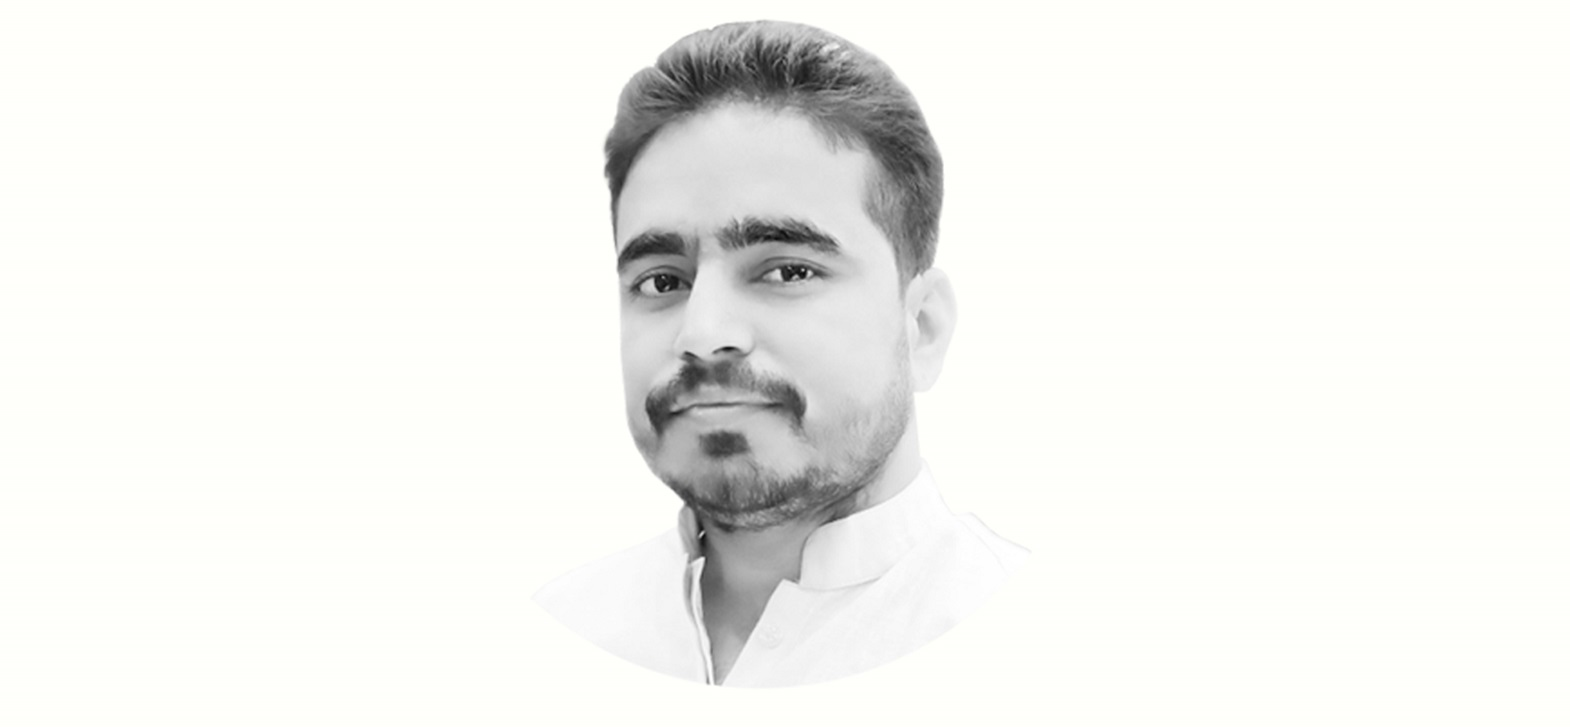 گلگت بلتستان اور مسئلہ کشمیر